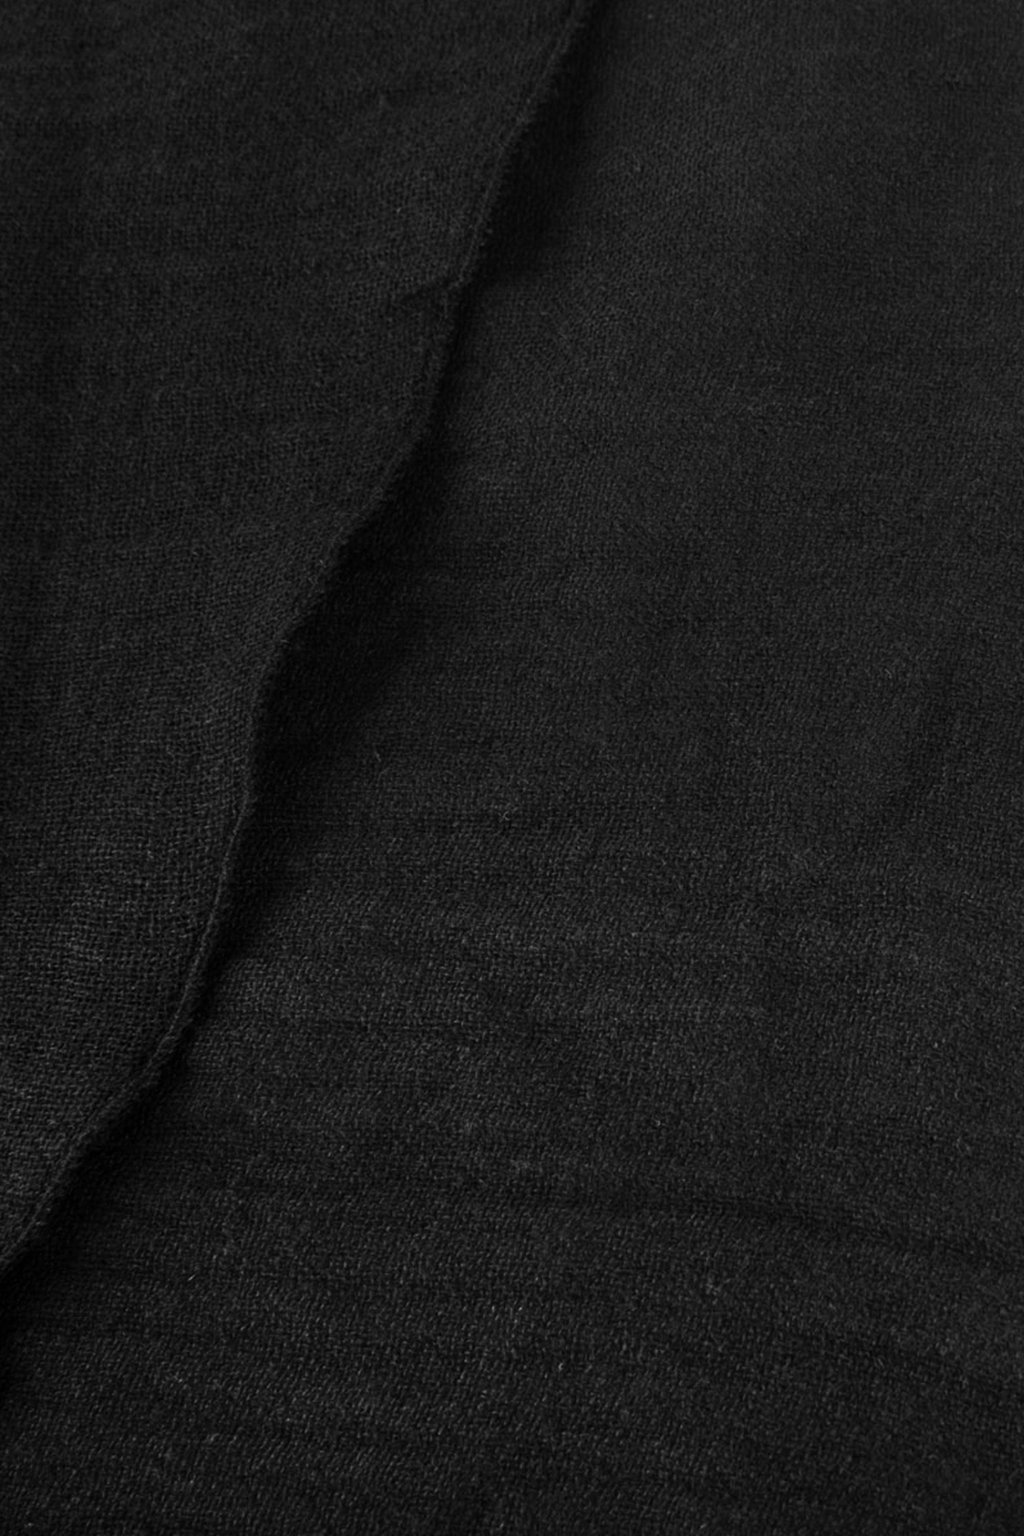 Scarf H018 Black 7